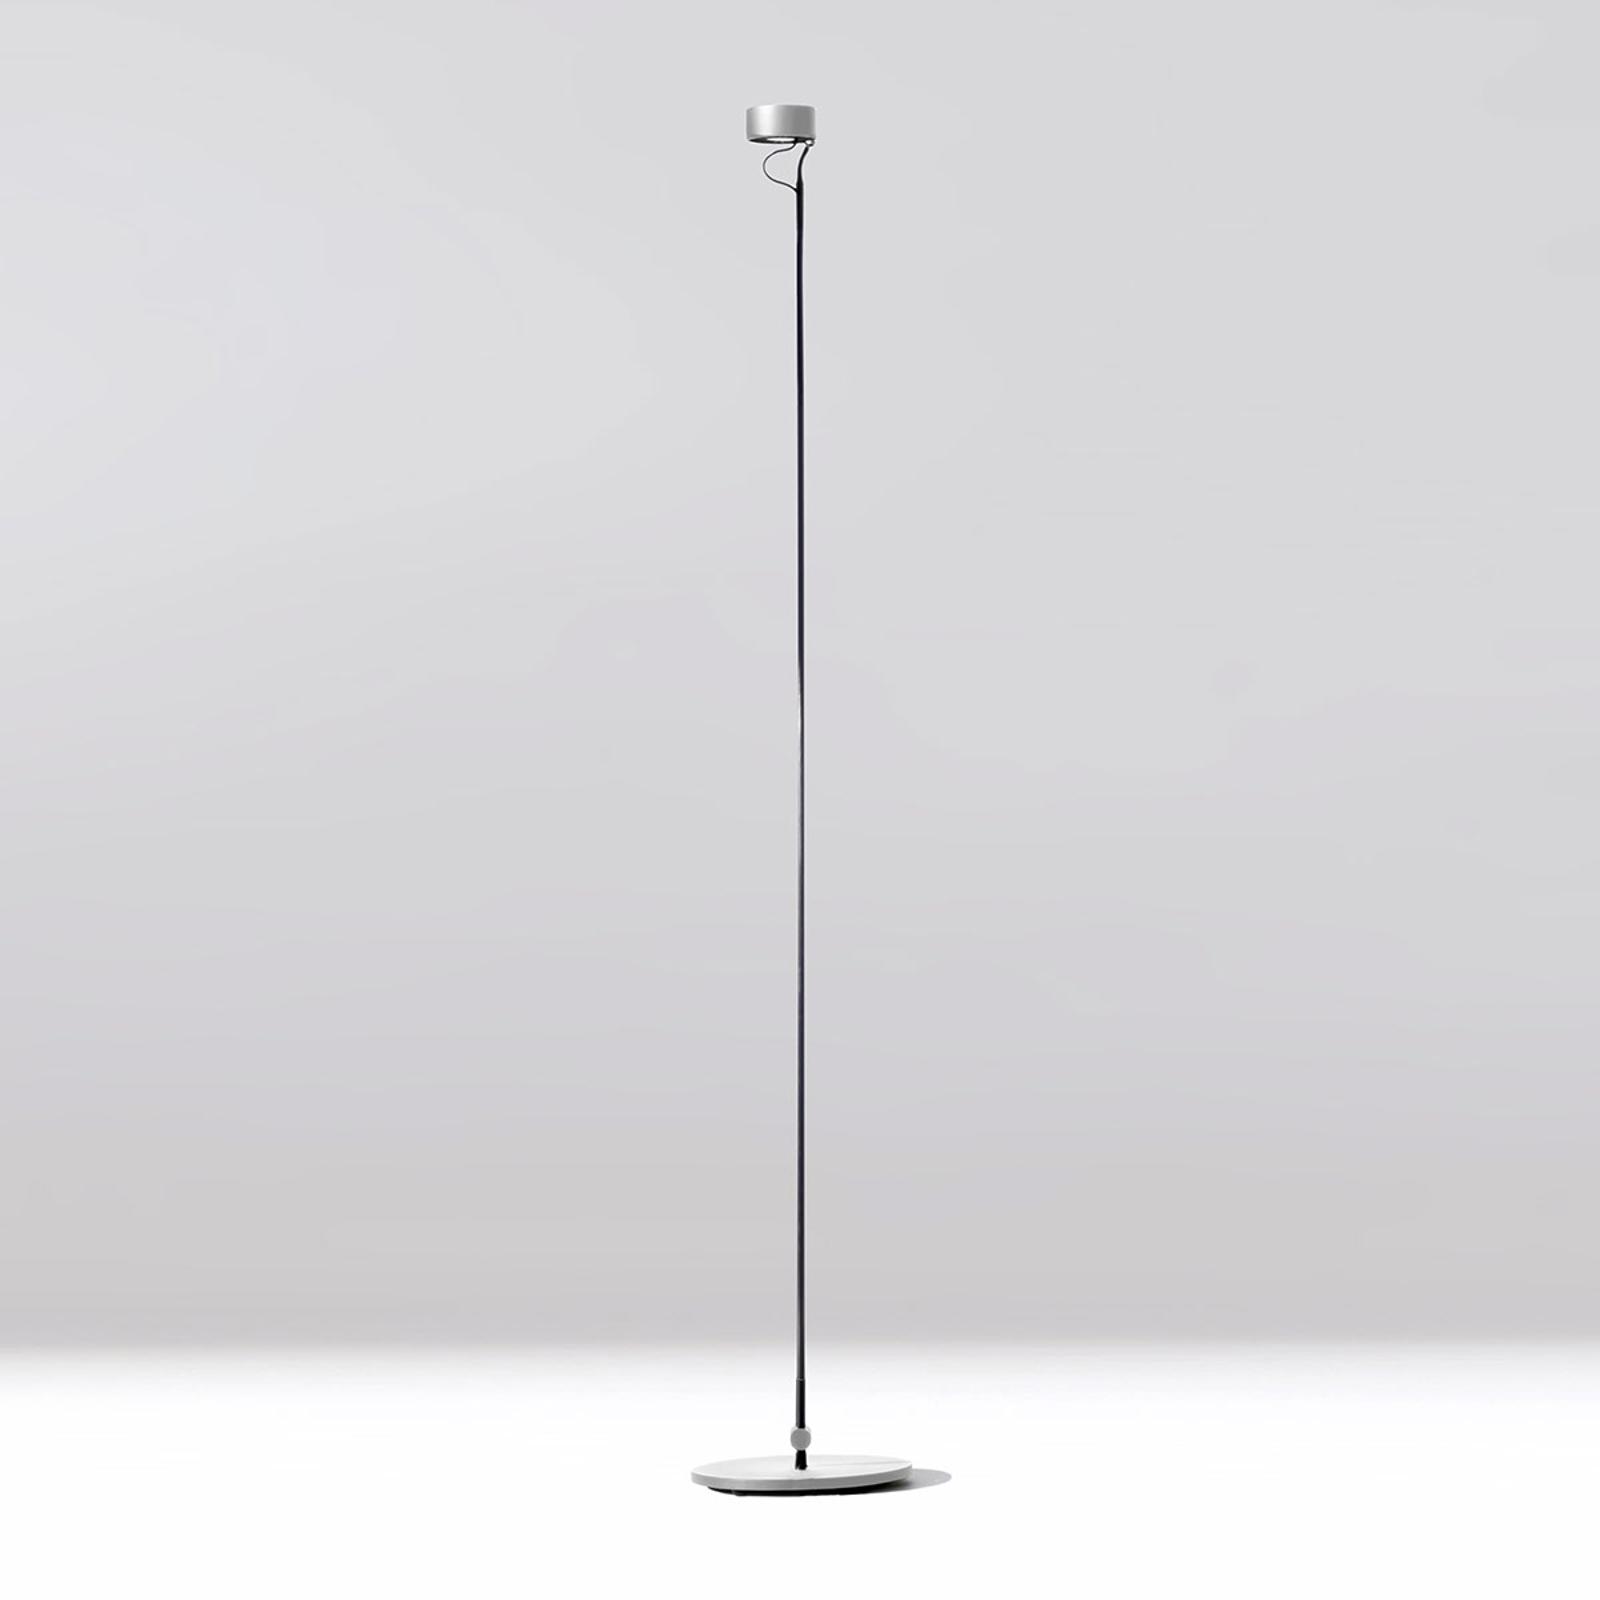 LED-Stehleuchte Basica 930 B, flexibel in Silber